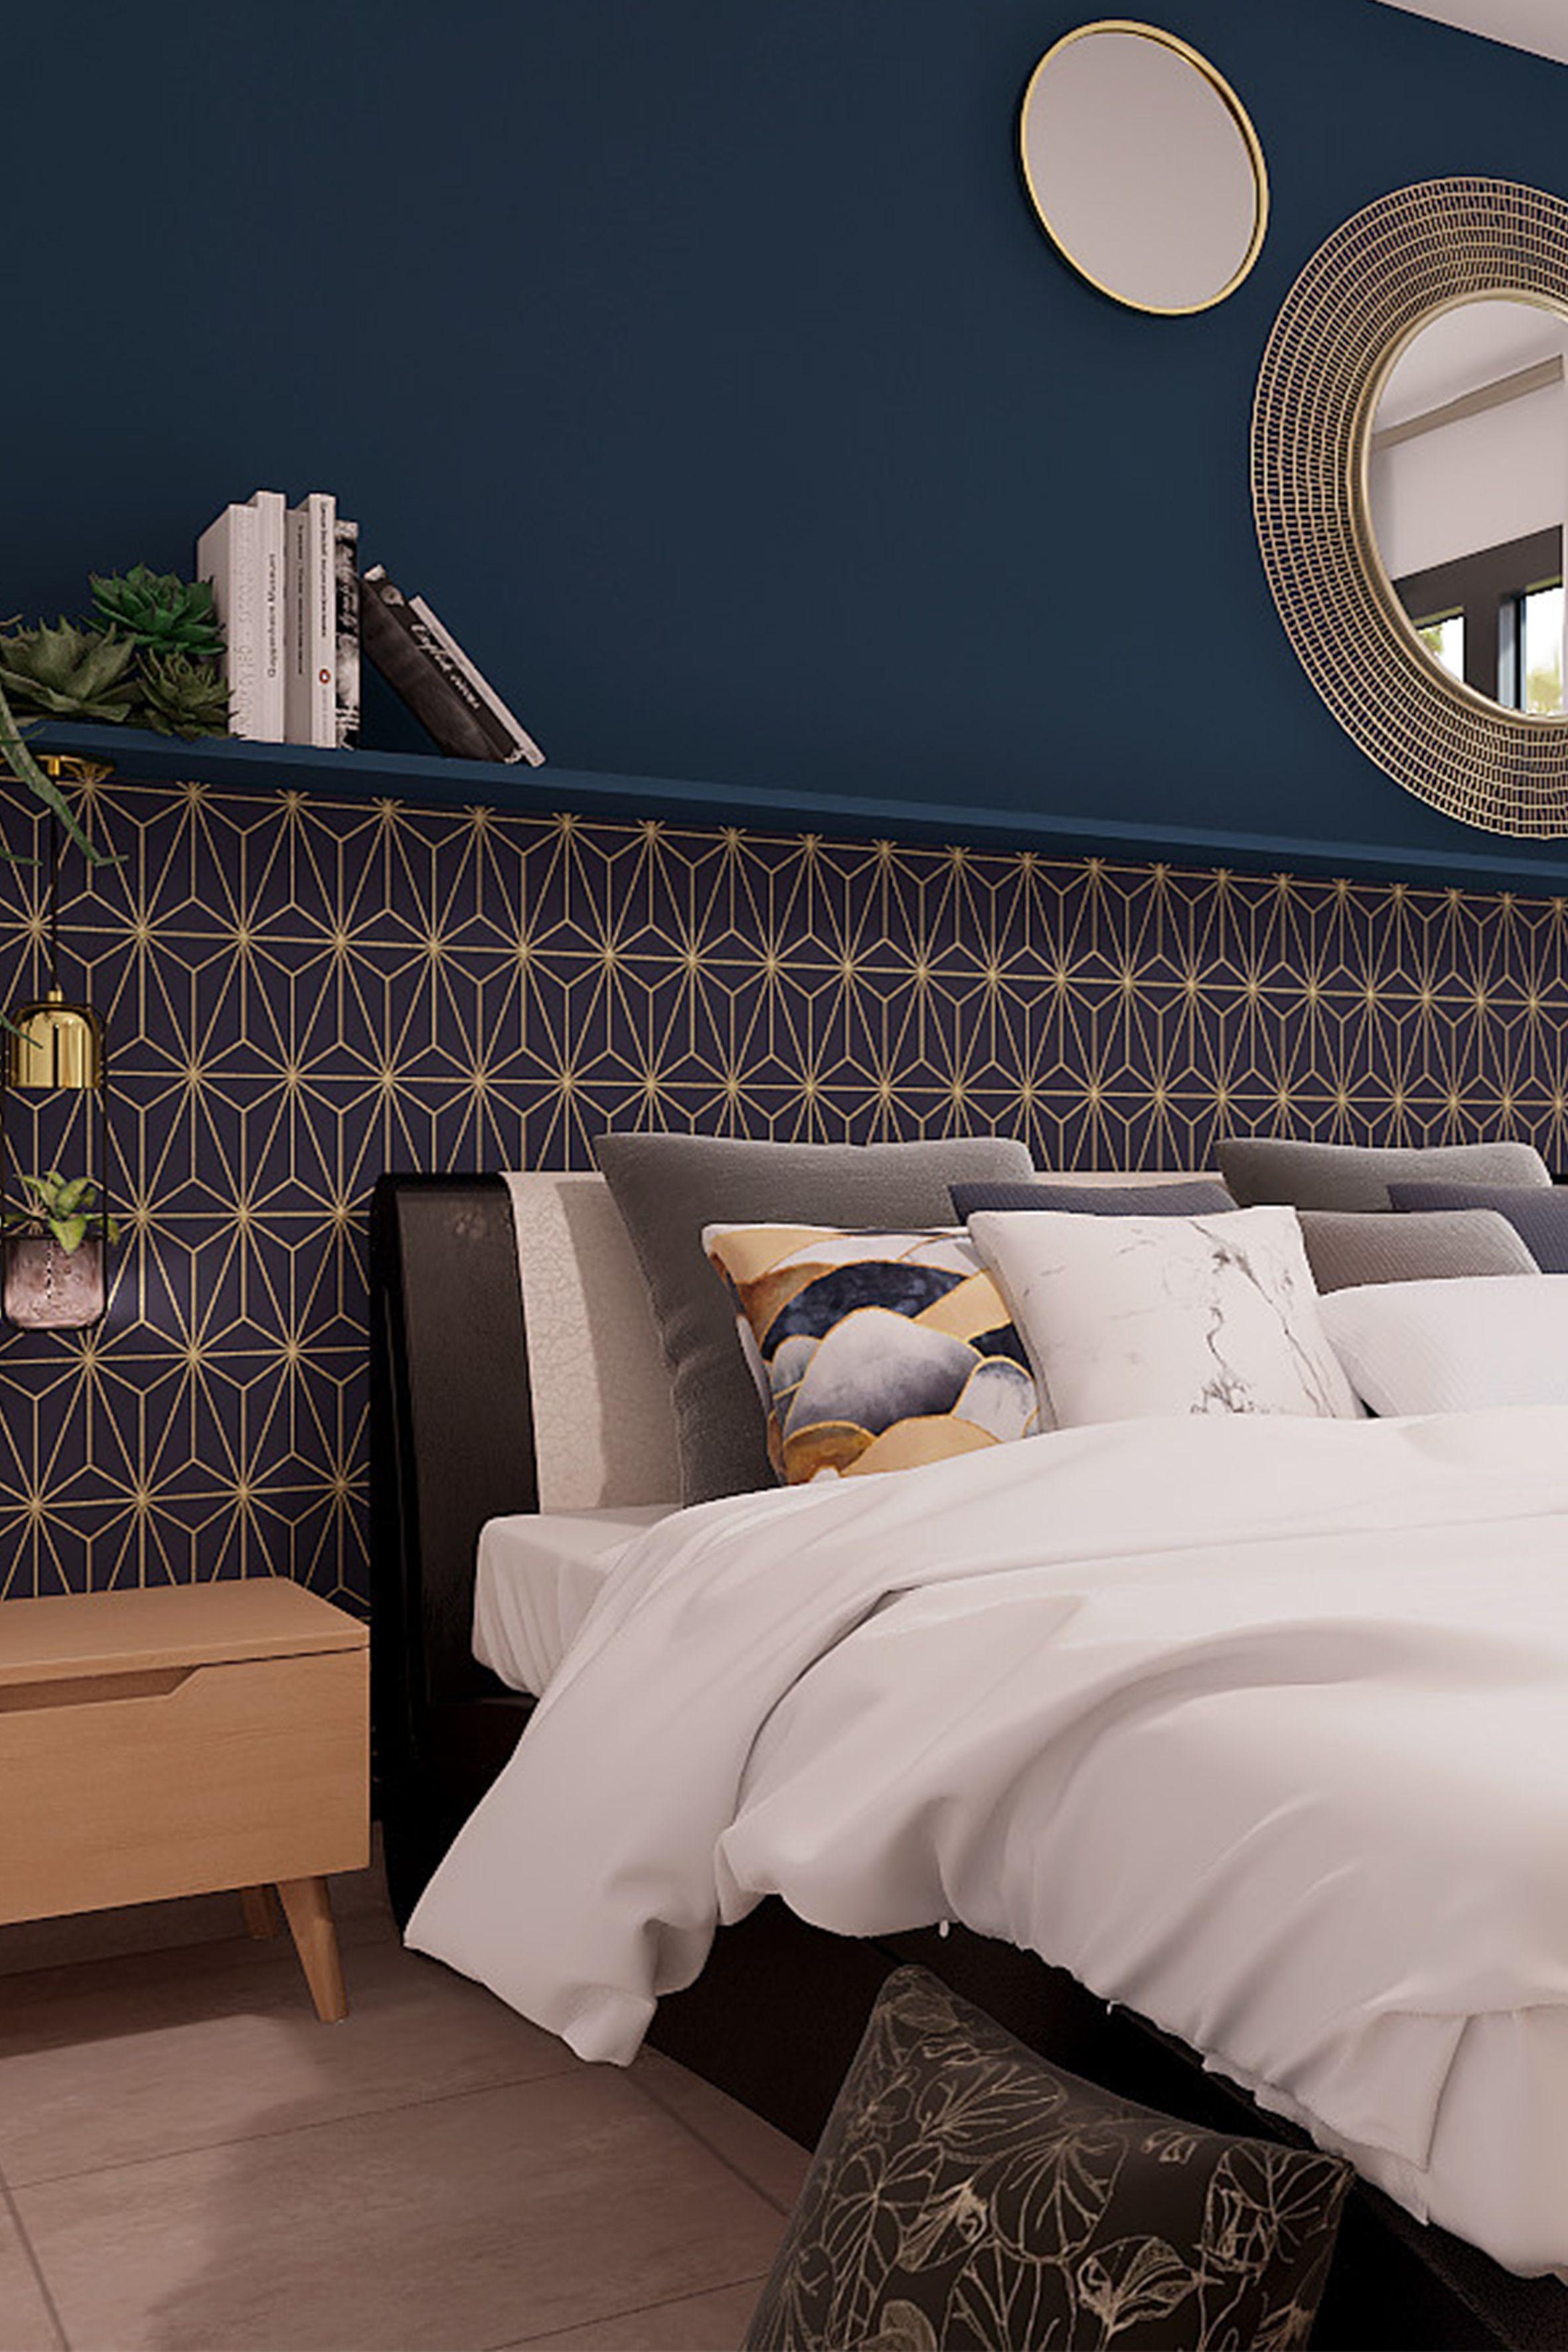 Chambre Art déco  Rhinov in 16  Luxury bedroom decor